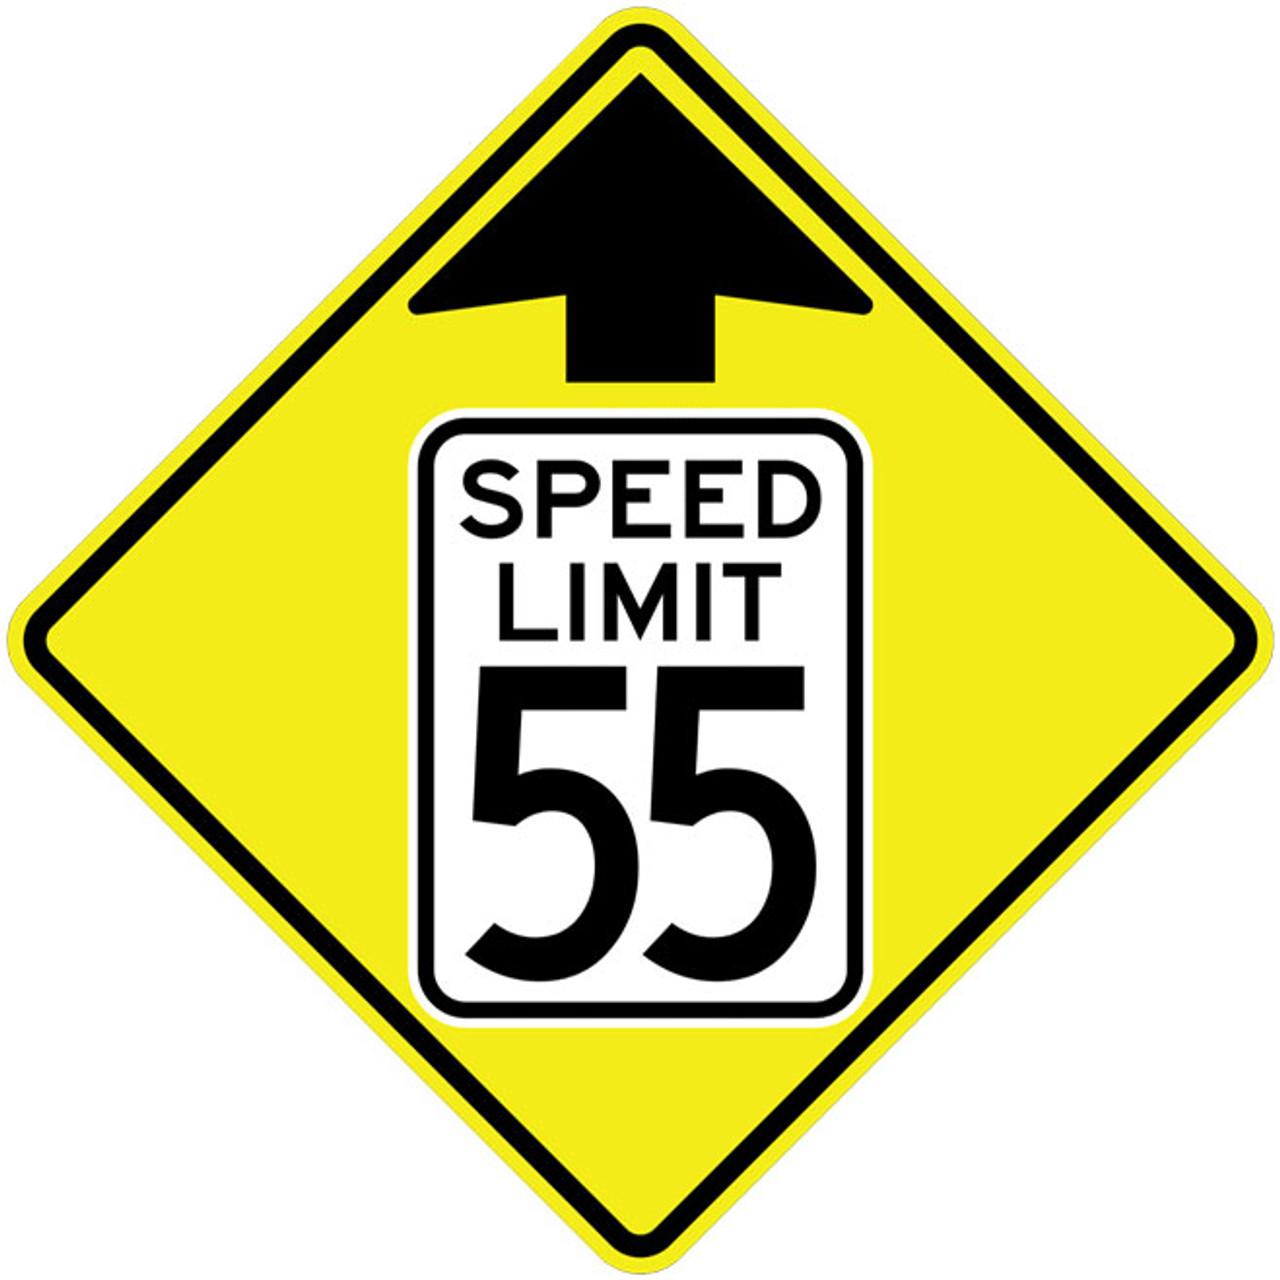 FED W3-5 Speed Reduction Sym Warning Sign